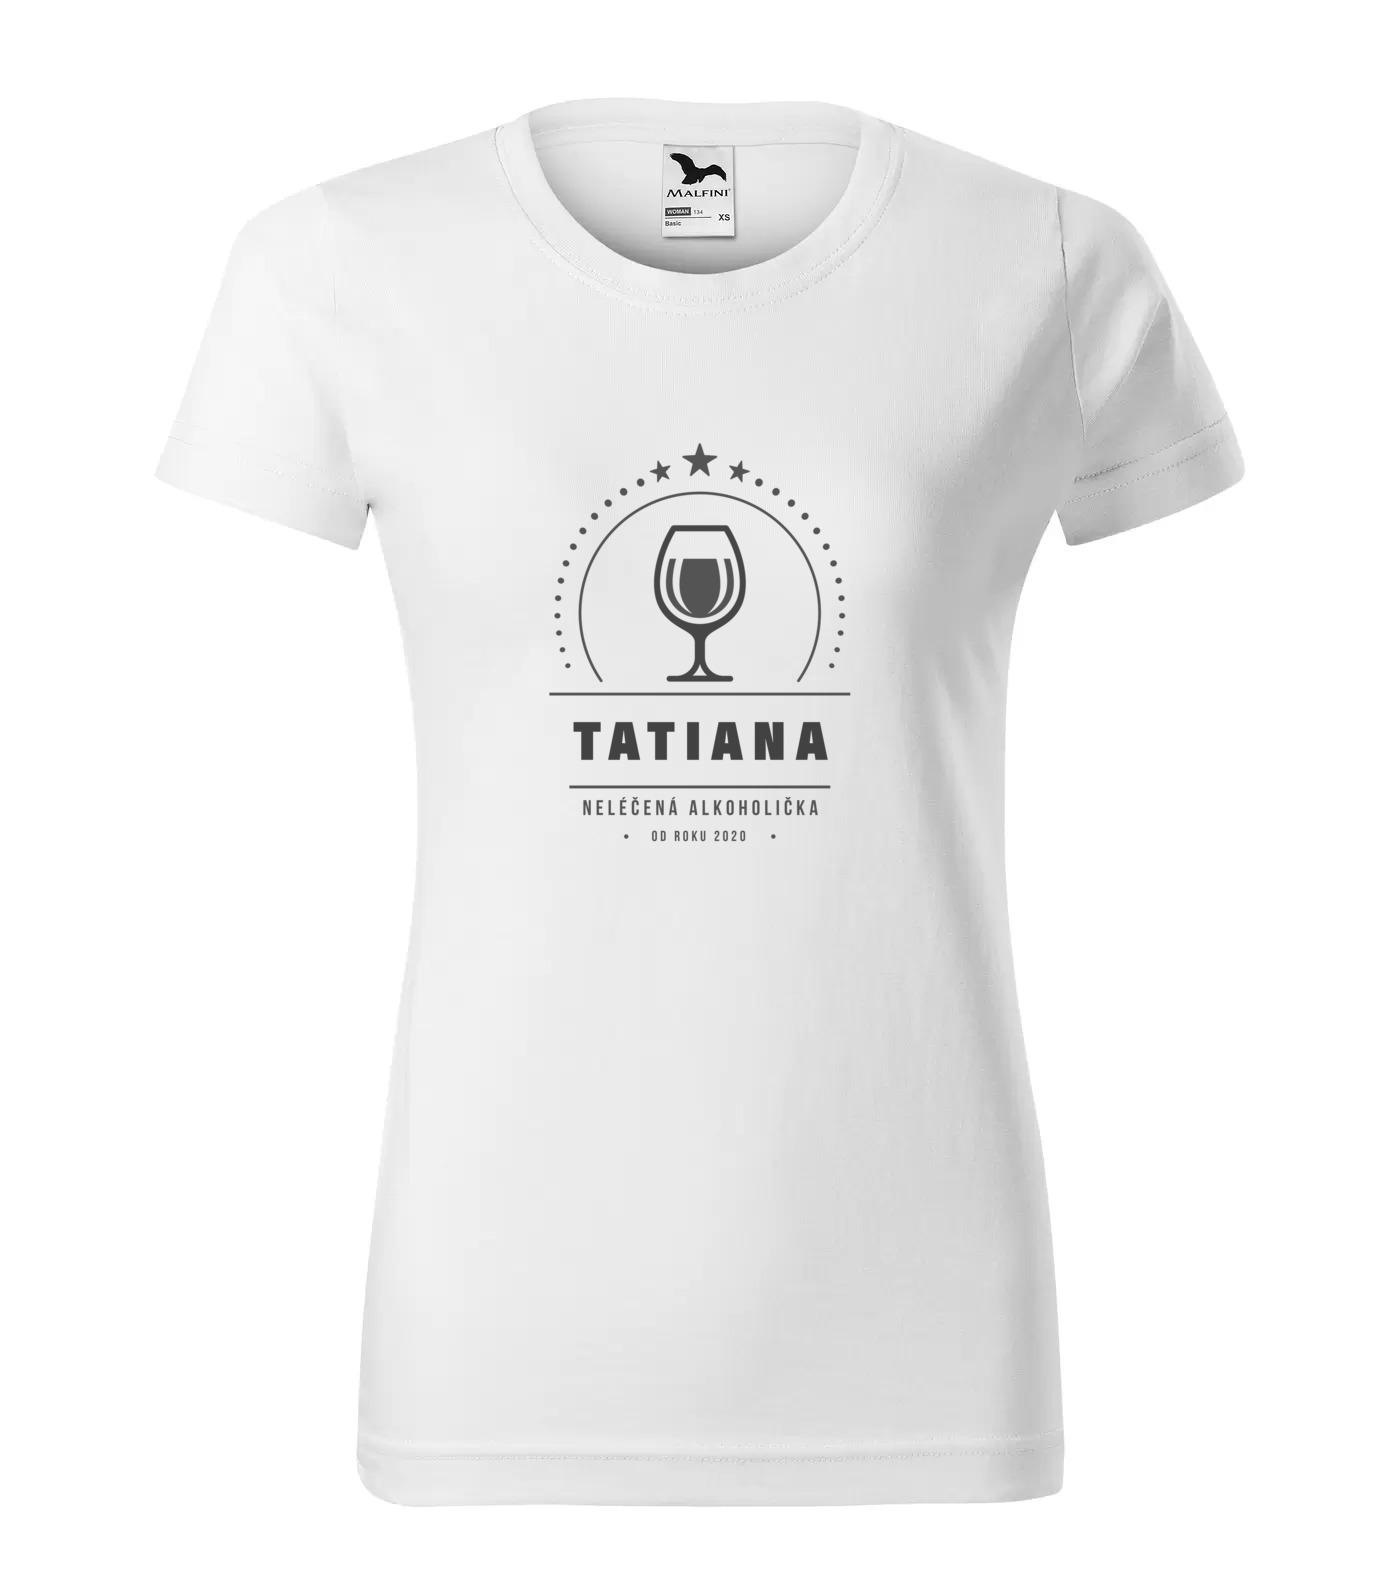 Tričko Alkoholička Tatiana